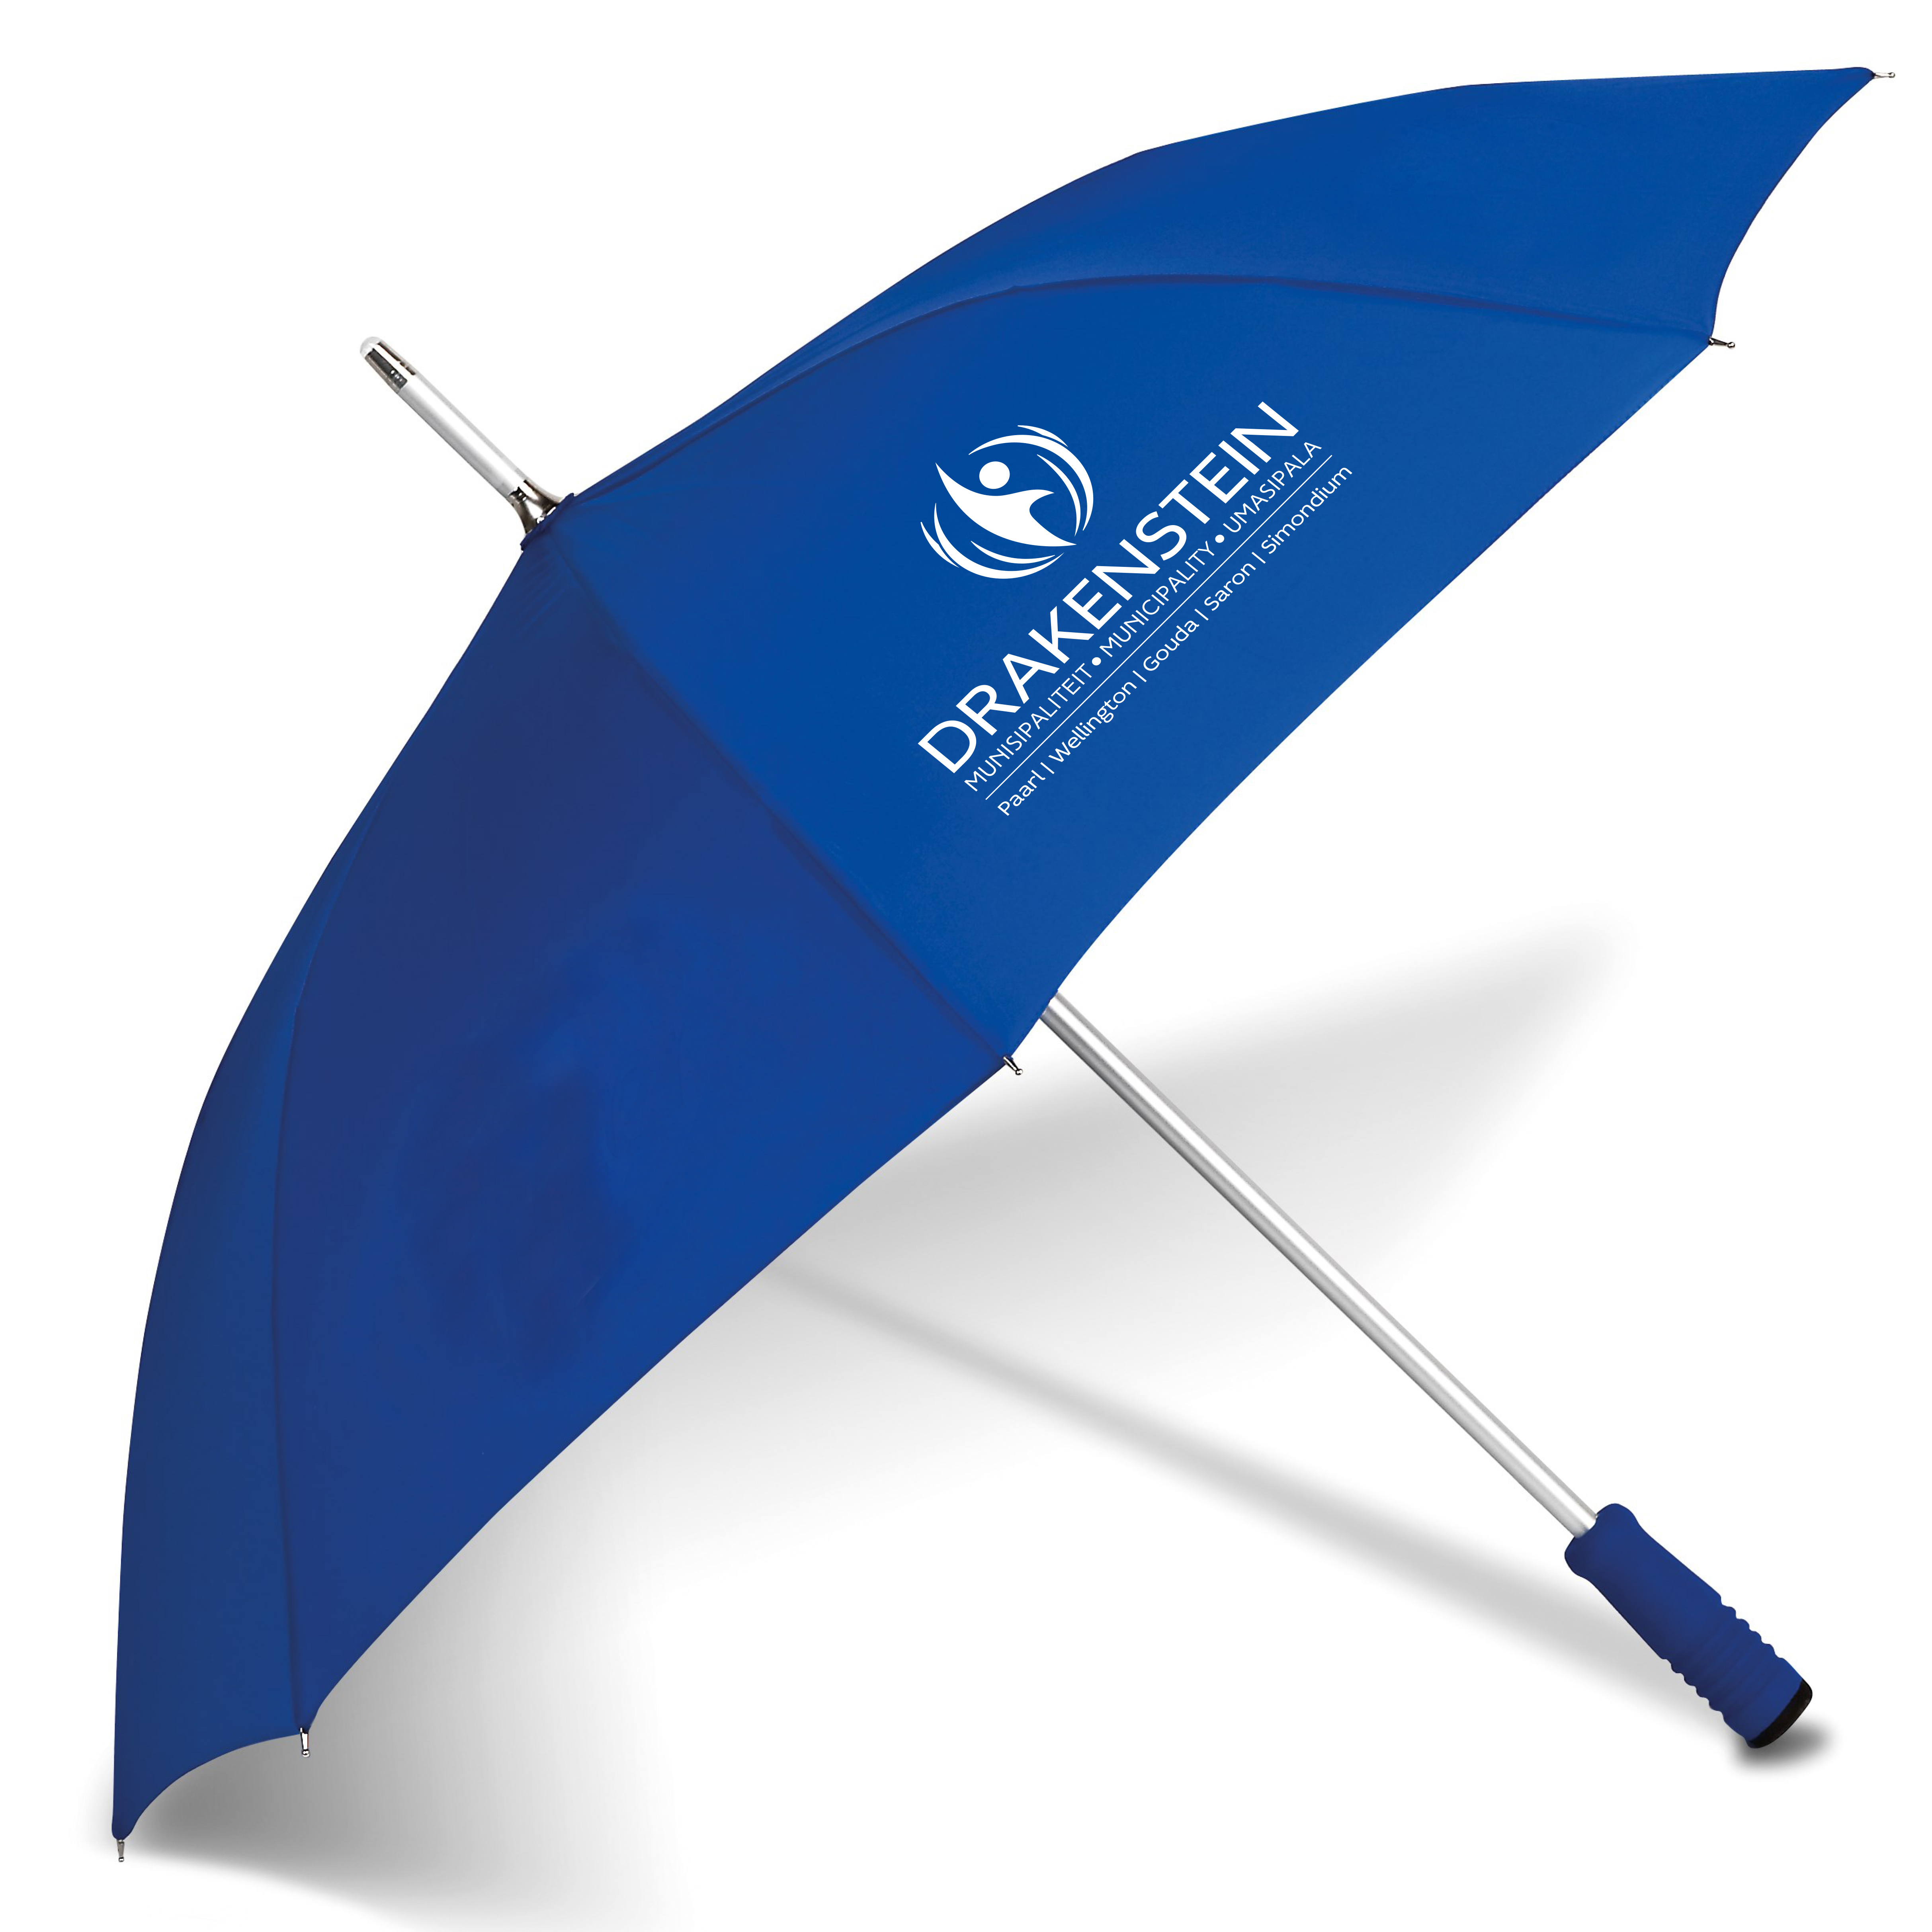 Drakenstein_Cloudburst_Umbrella.jpg